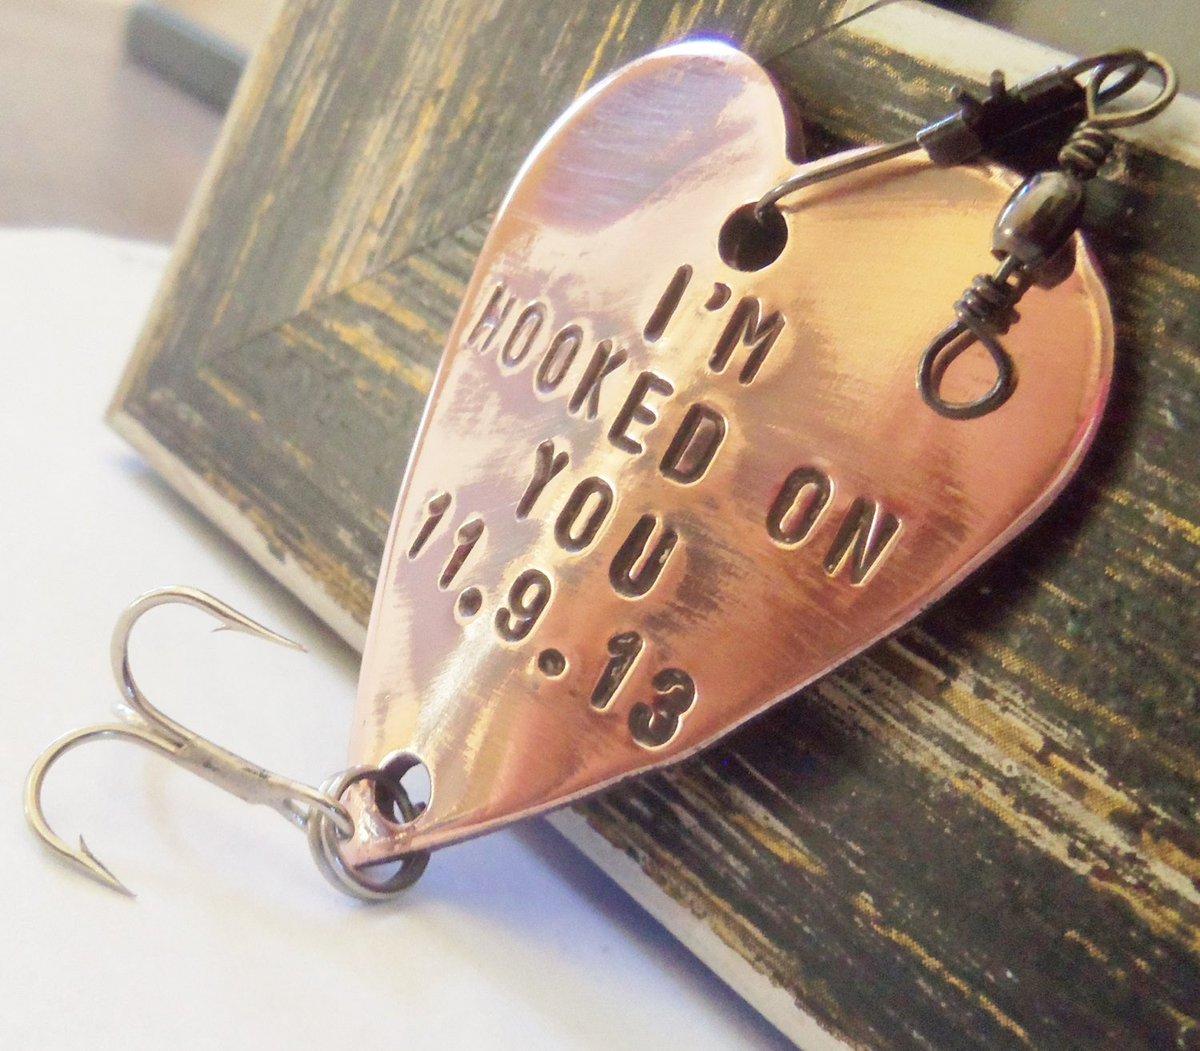 Fishing Gift Custom Fishing Lure Personalized Fishing Lure Hooked on You Fish Hook Gift for Men Outdoorsman Sportsman Anniversary Husband http://tuppu.net/a4e7cfa9 #Shopify #CandTCustomLures #Anniversary_husband